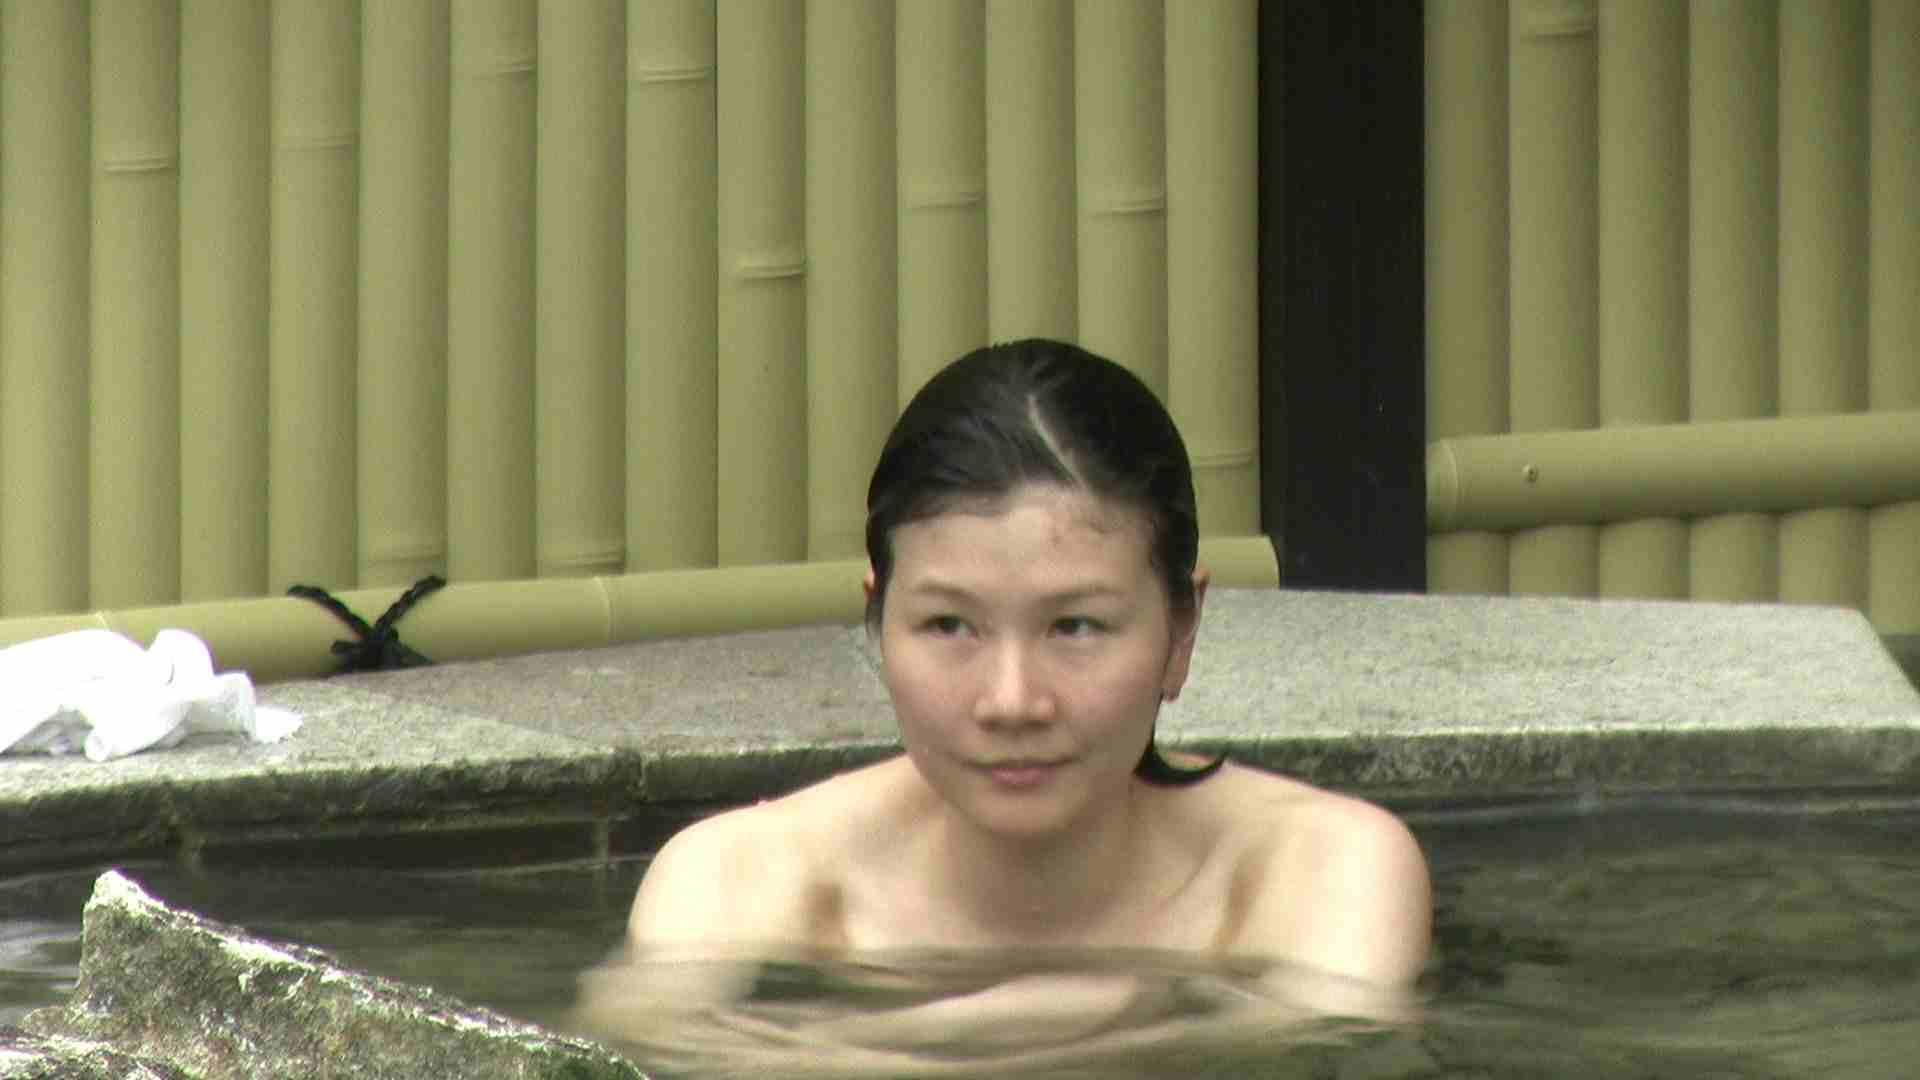 Aquaな露天風呂Vol.187 盗撮映像  99Pix 14